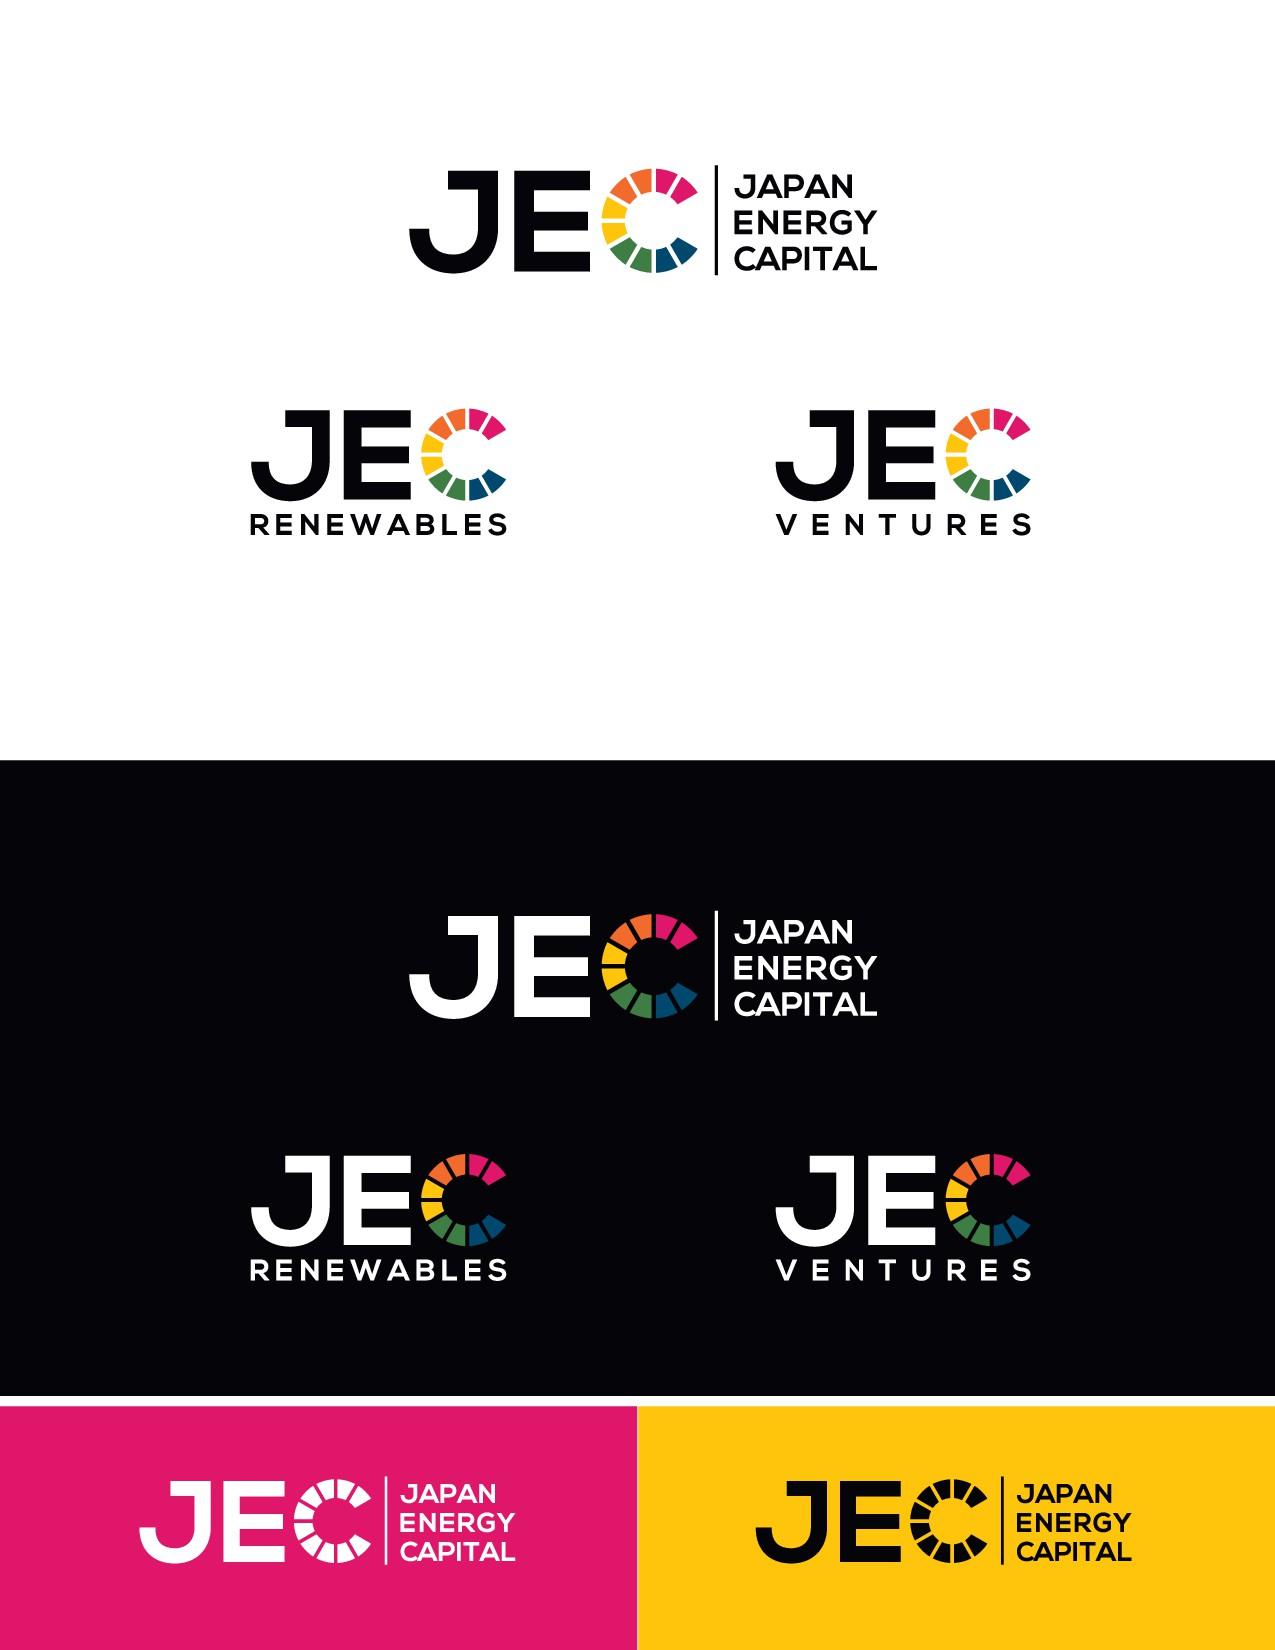 JEC (Japan Energy Capital)